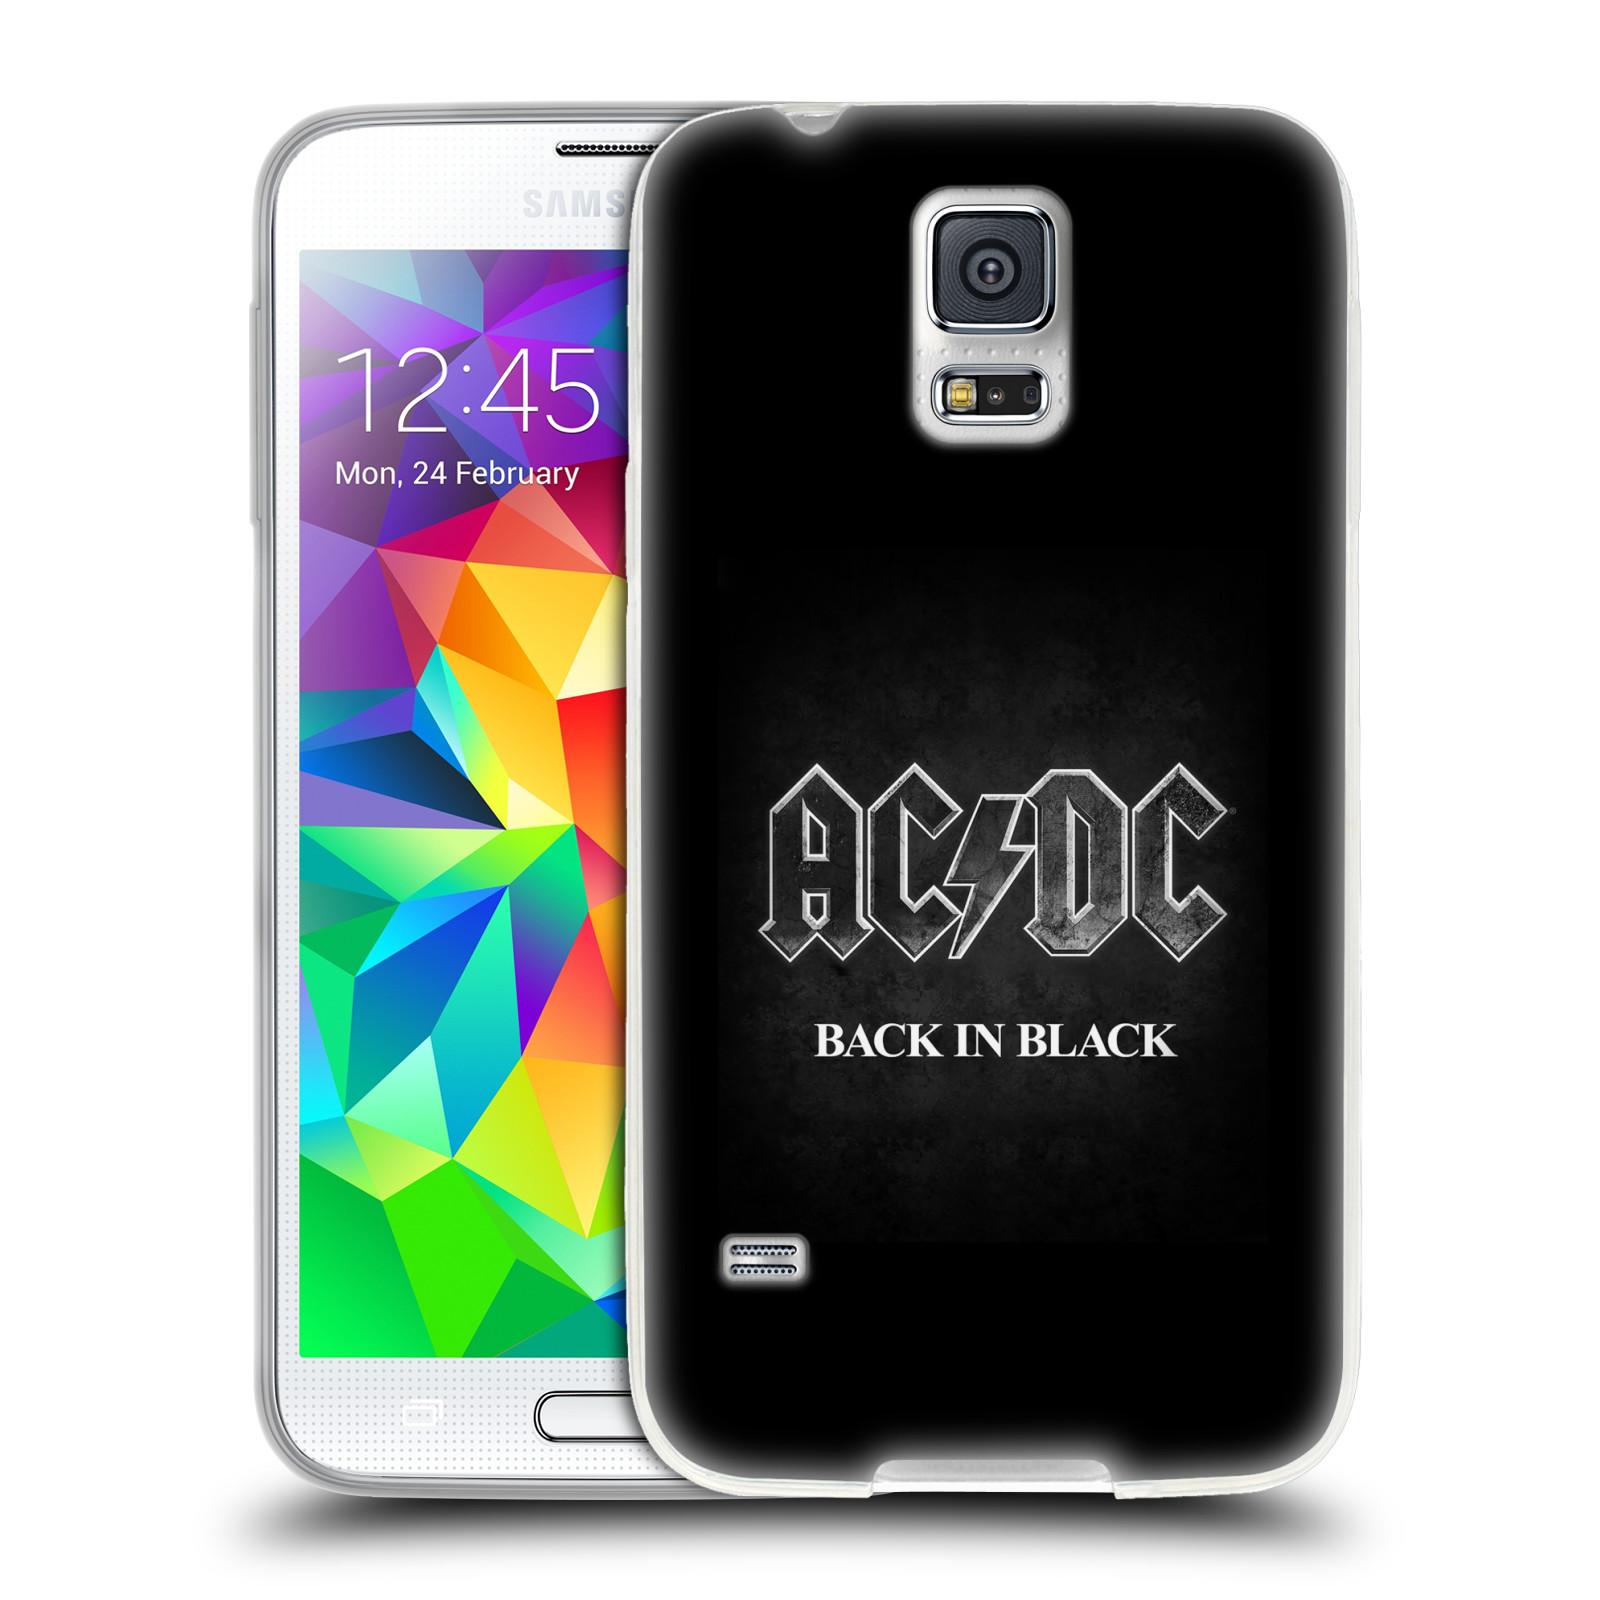 Silikonové pouzdro na mobil Samsung Galaxy S5 Neo HEAD CASE AC/DC BACK IN BLACK